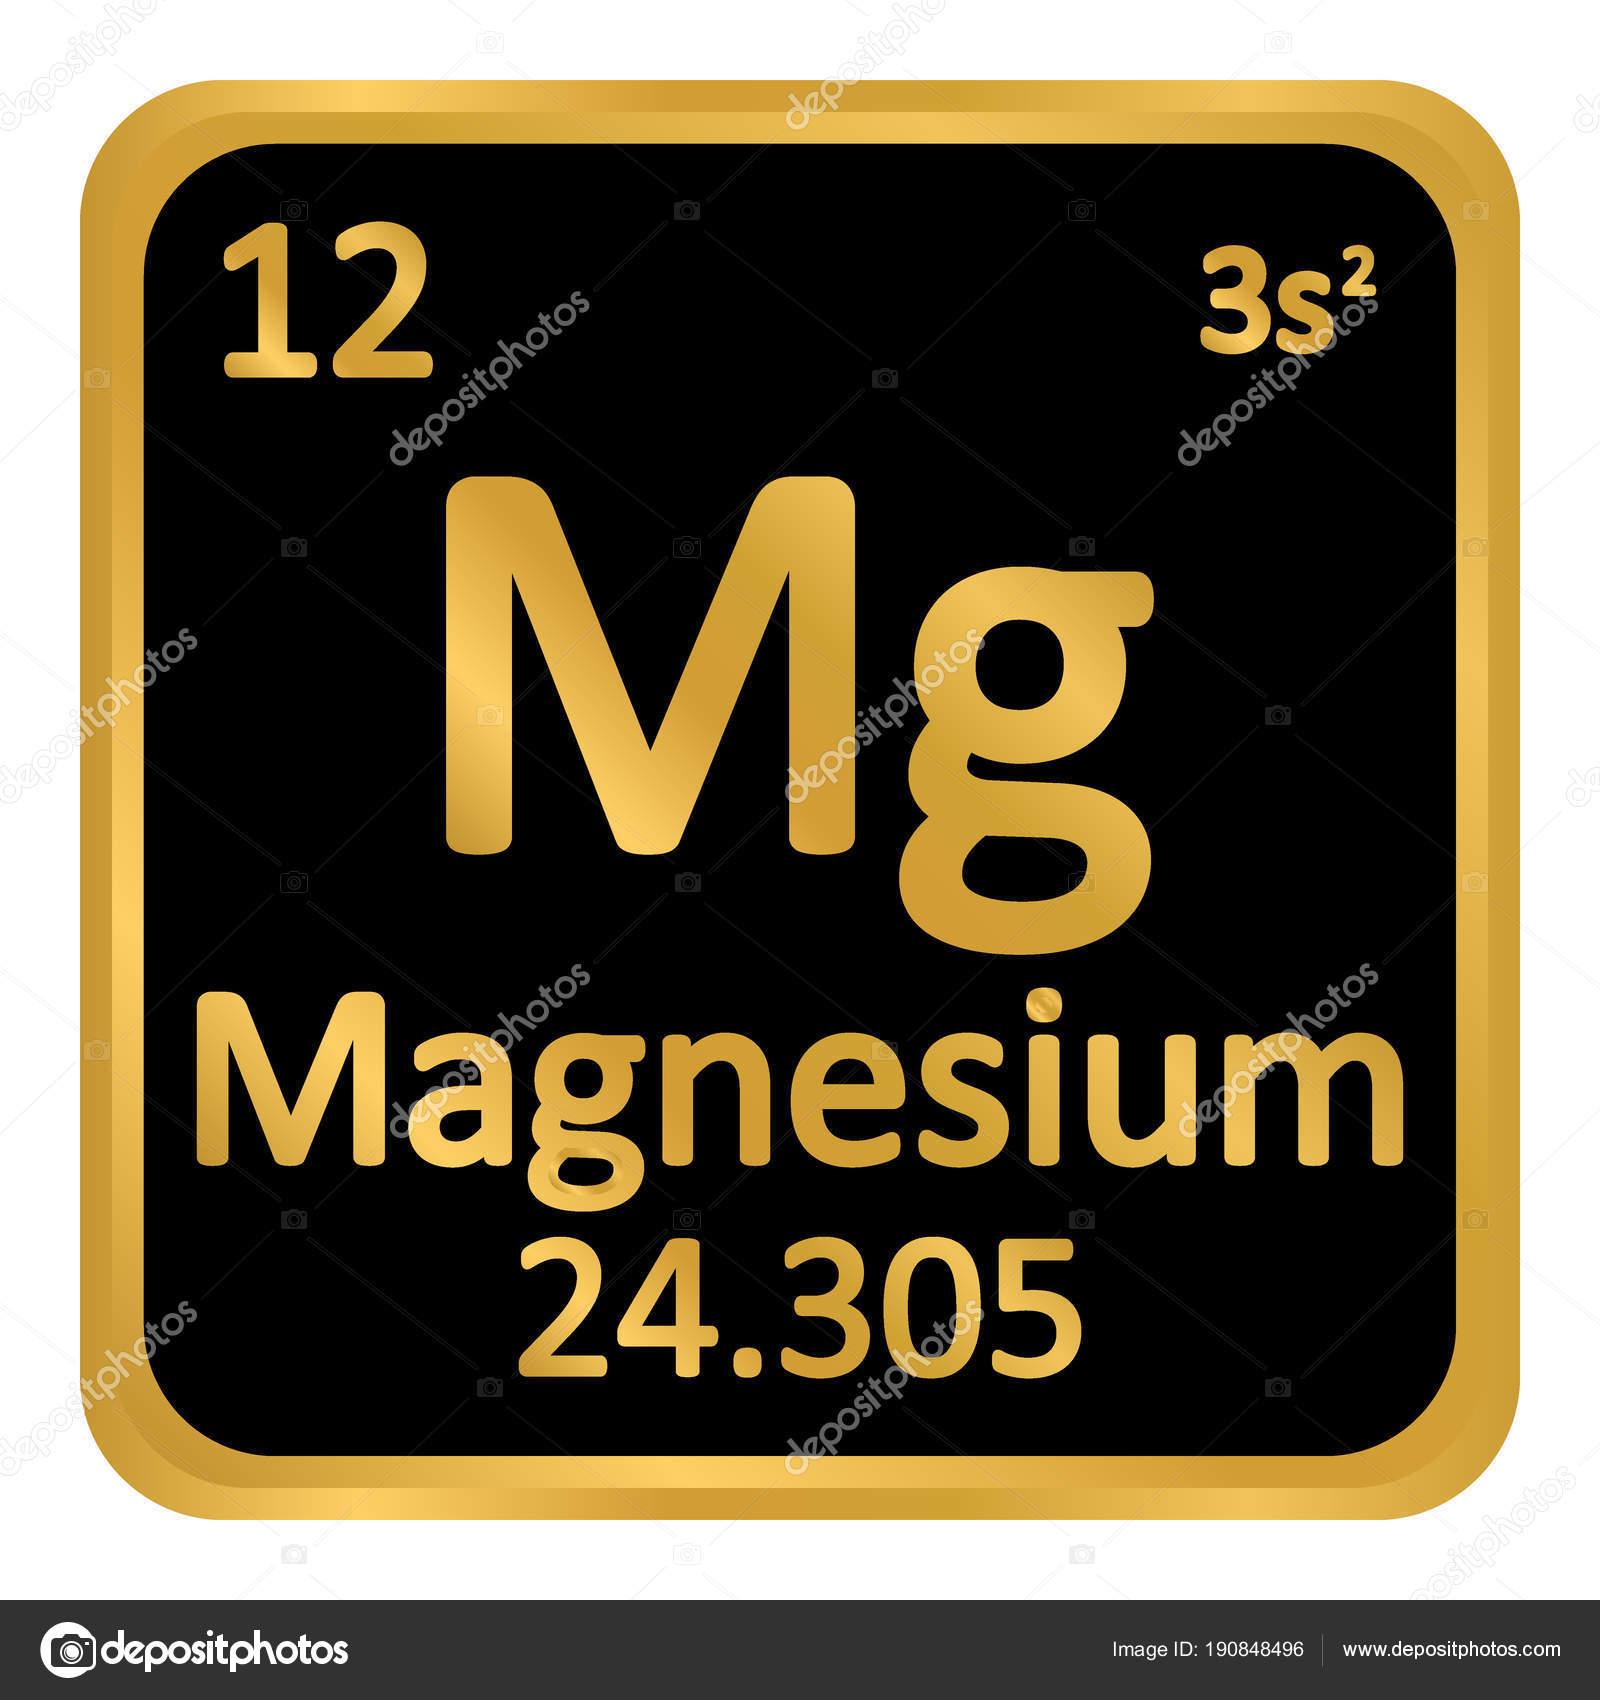 Periodic table element magnesium icon stock vector konstsem periodic table element magnesium icon stock vector urtaz Image collections